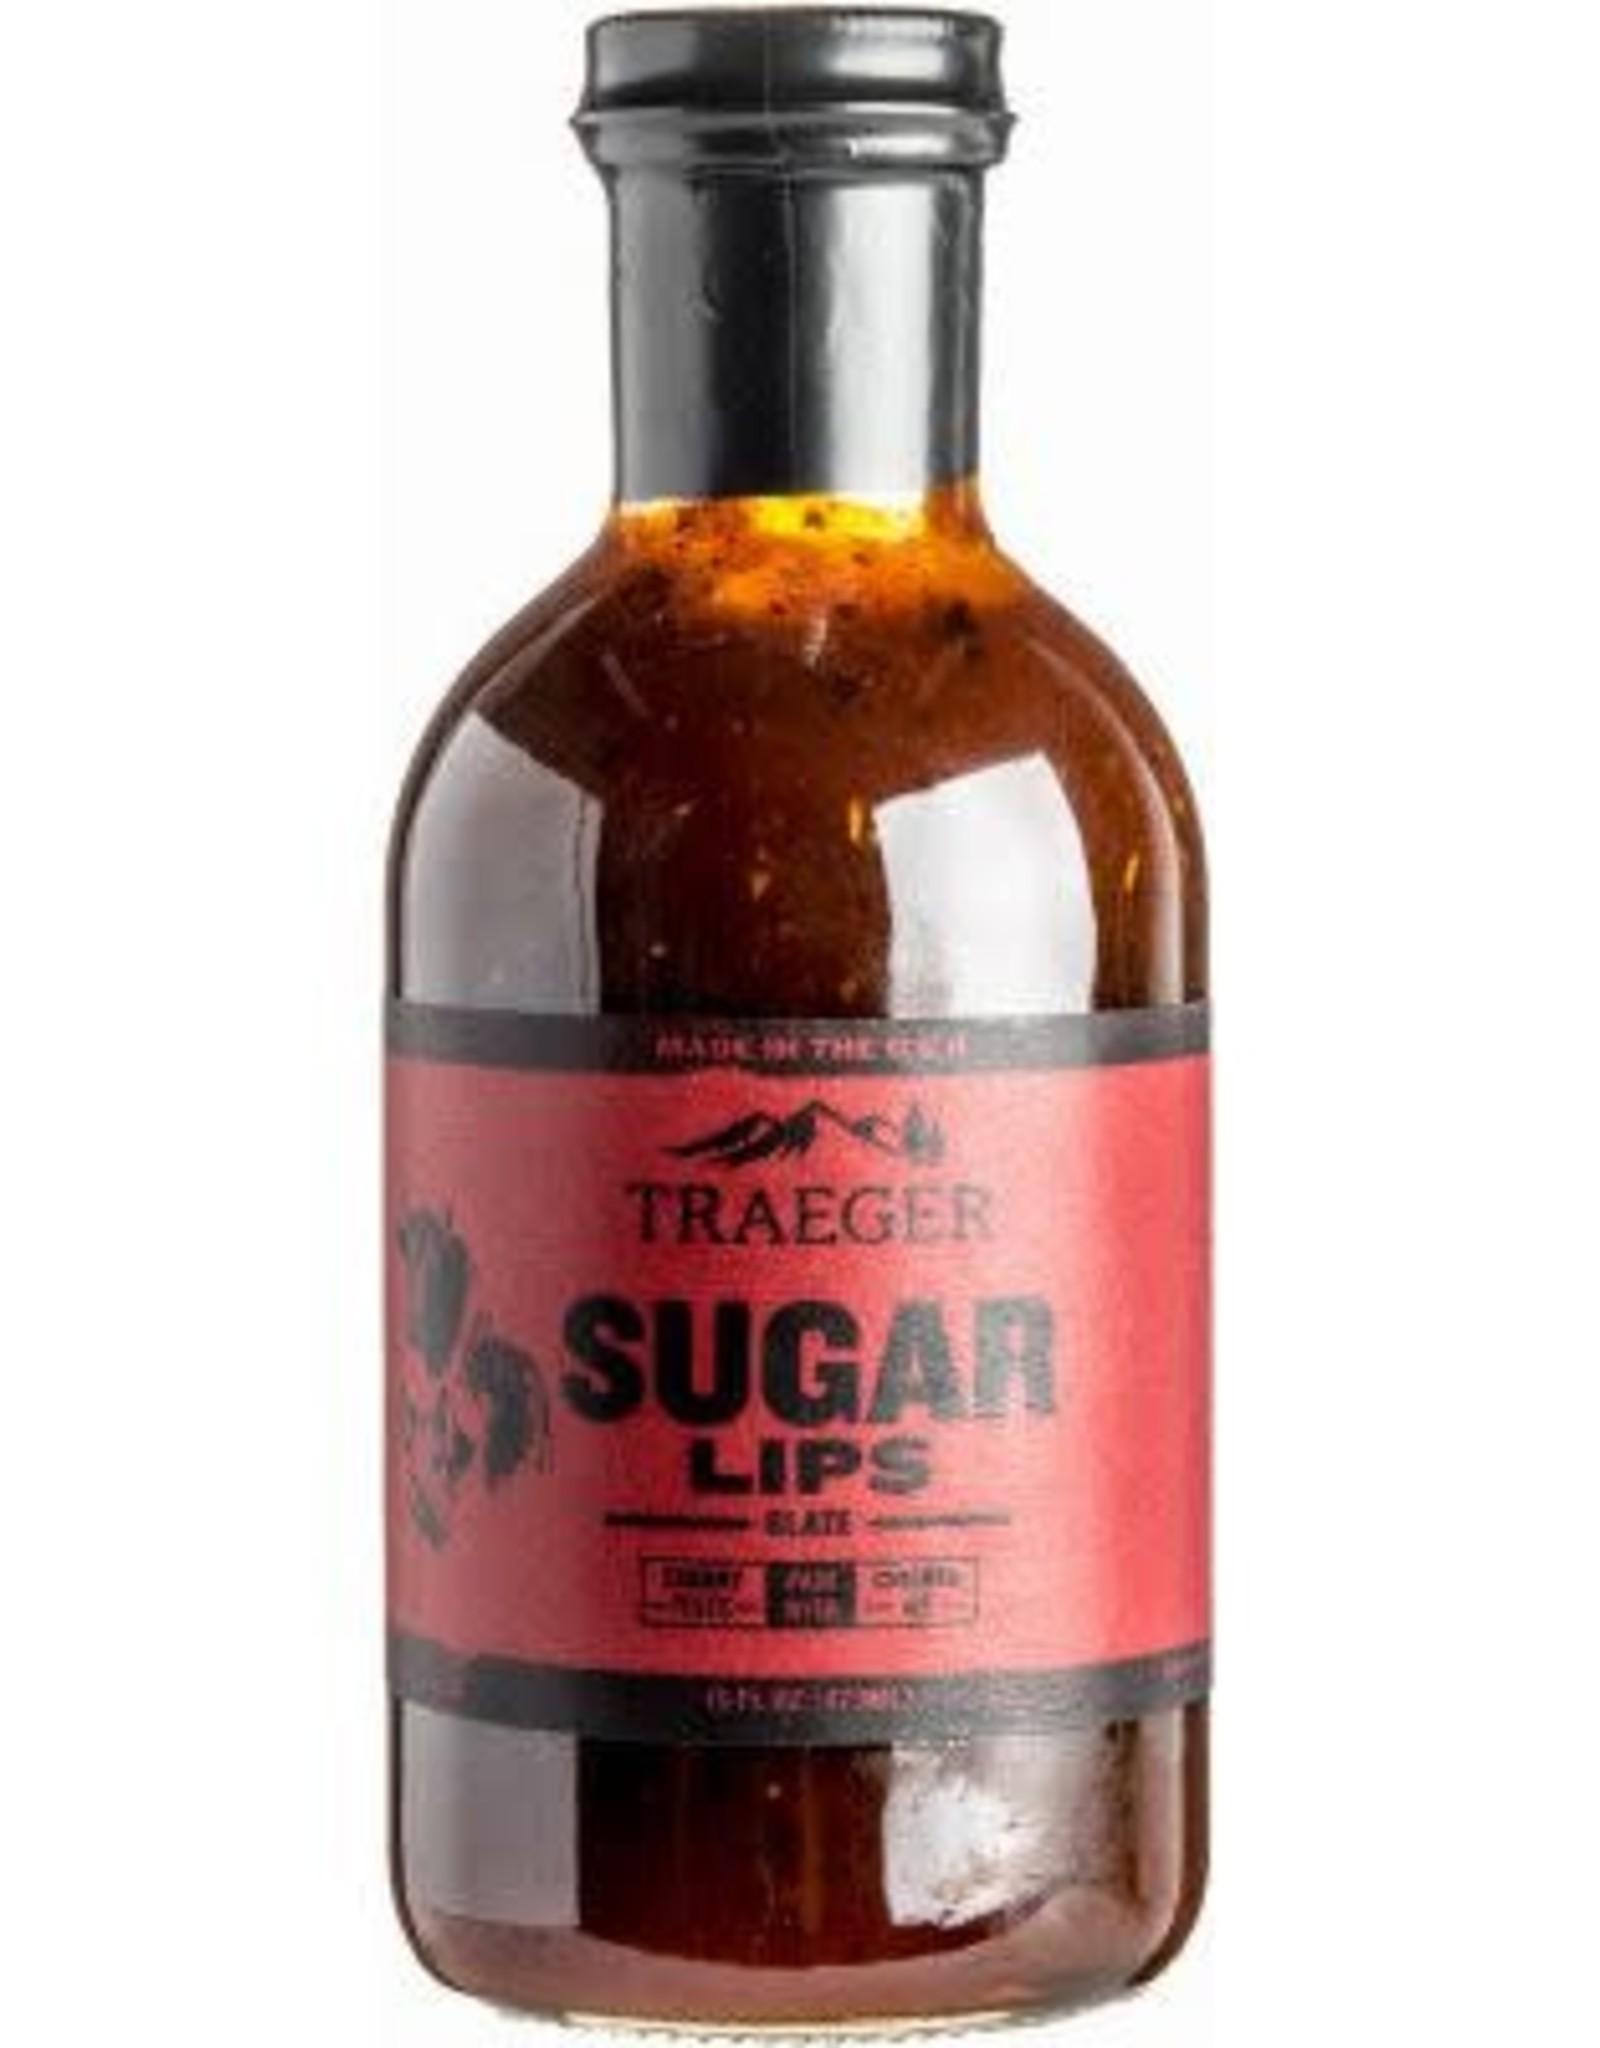 Traeger Traeger Sugar Lips BBQ Sauce - SAU030